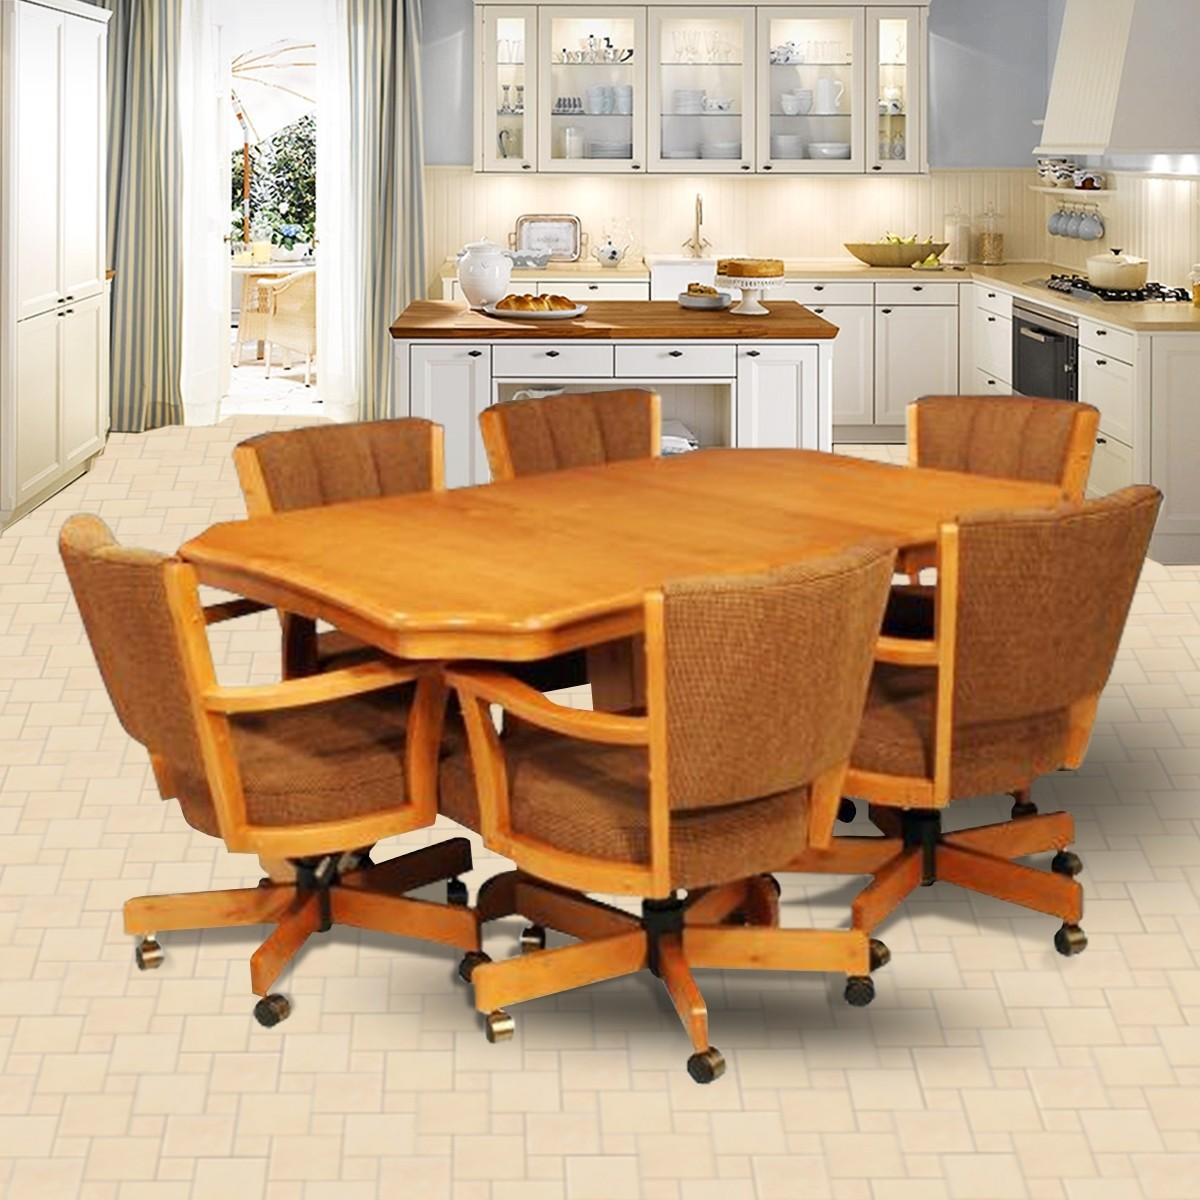 CR Joseph 9105GC Dining Set with Swivel Tilt Caster Chairs & CR Joseph Dining Set with Swivel Tilt Caster Chairs: Wood Dinette Sets